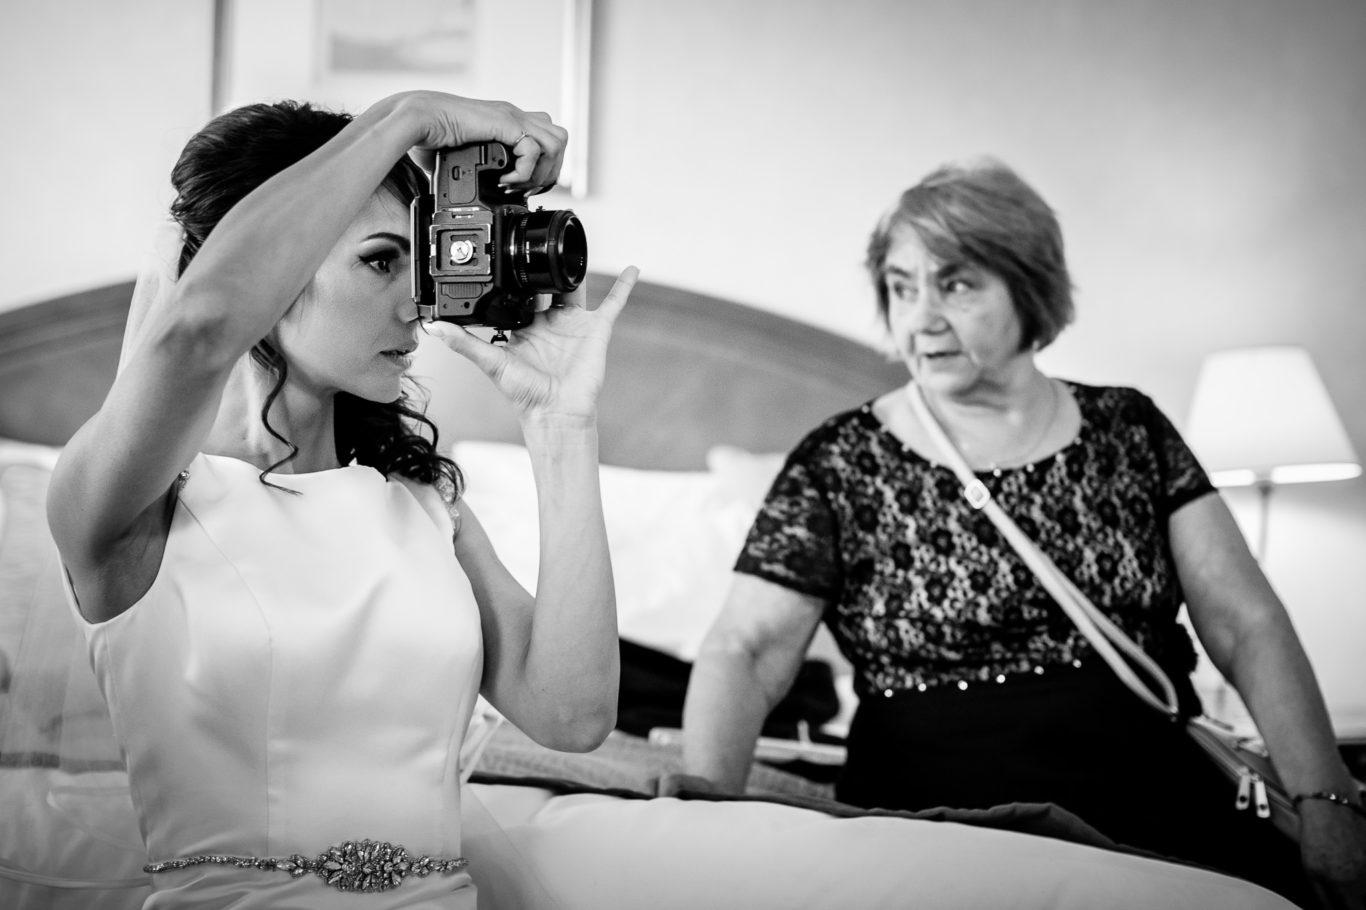 0248-fotografie-nunta-bucuresti-dana-radu-fotograf-ciprian-dumitrescu-cd2_6801